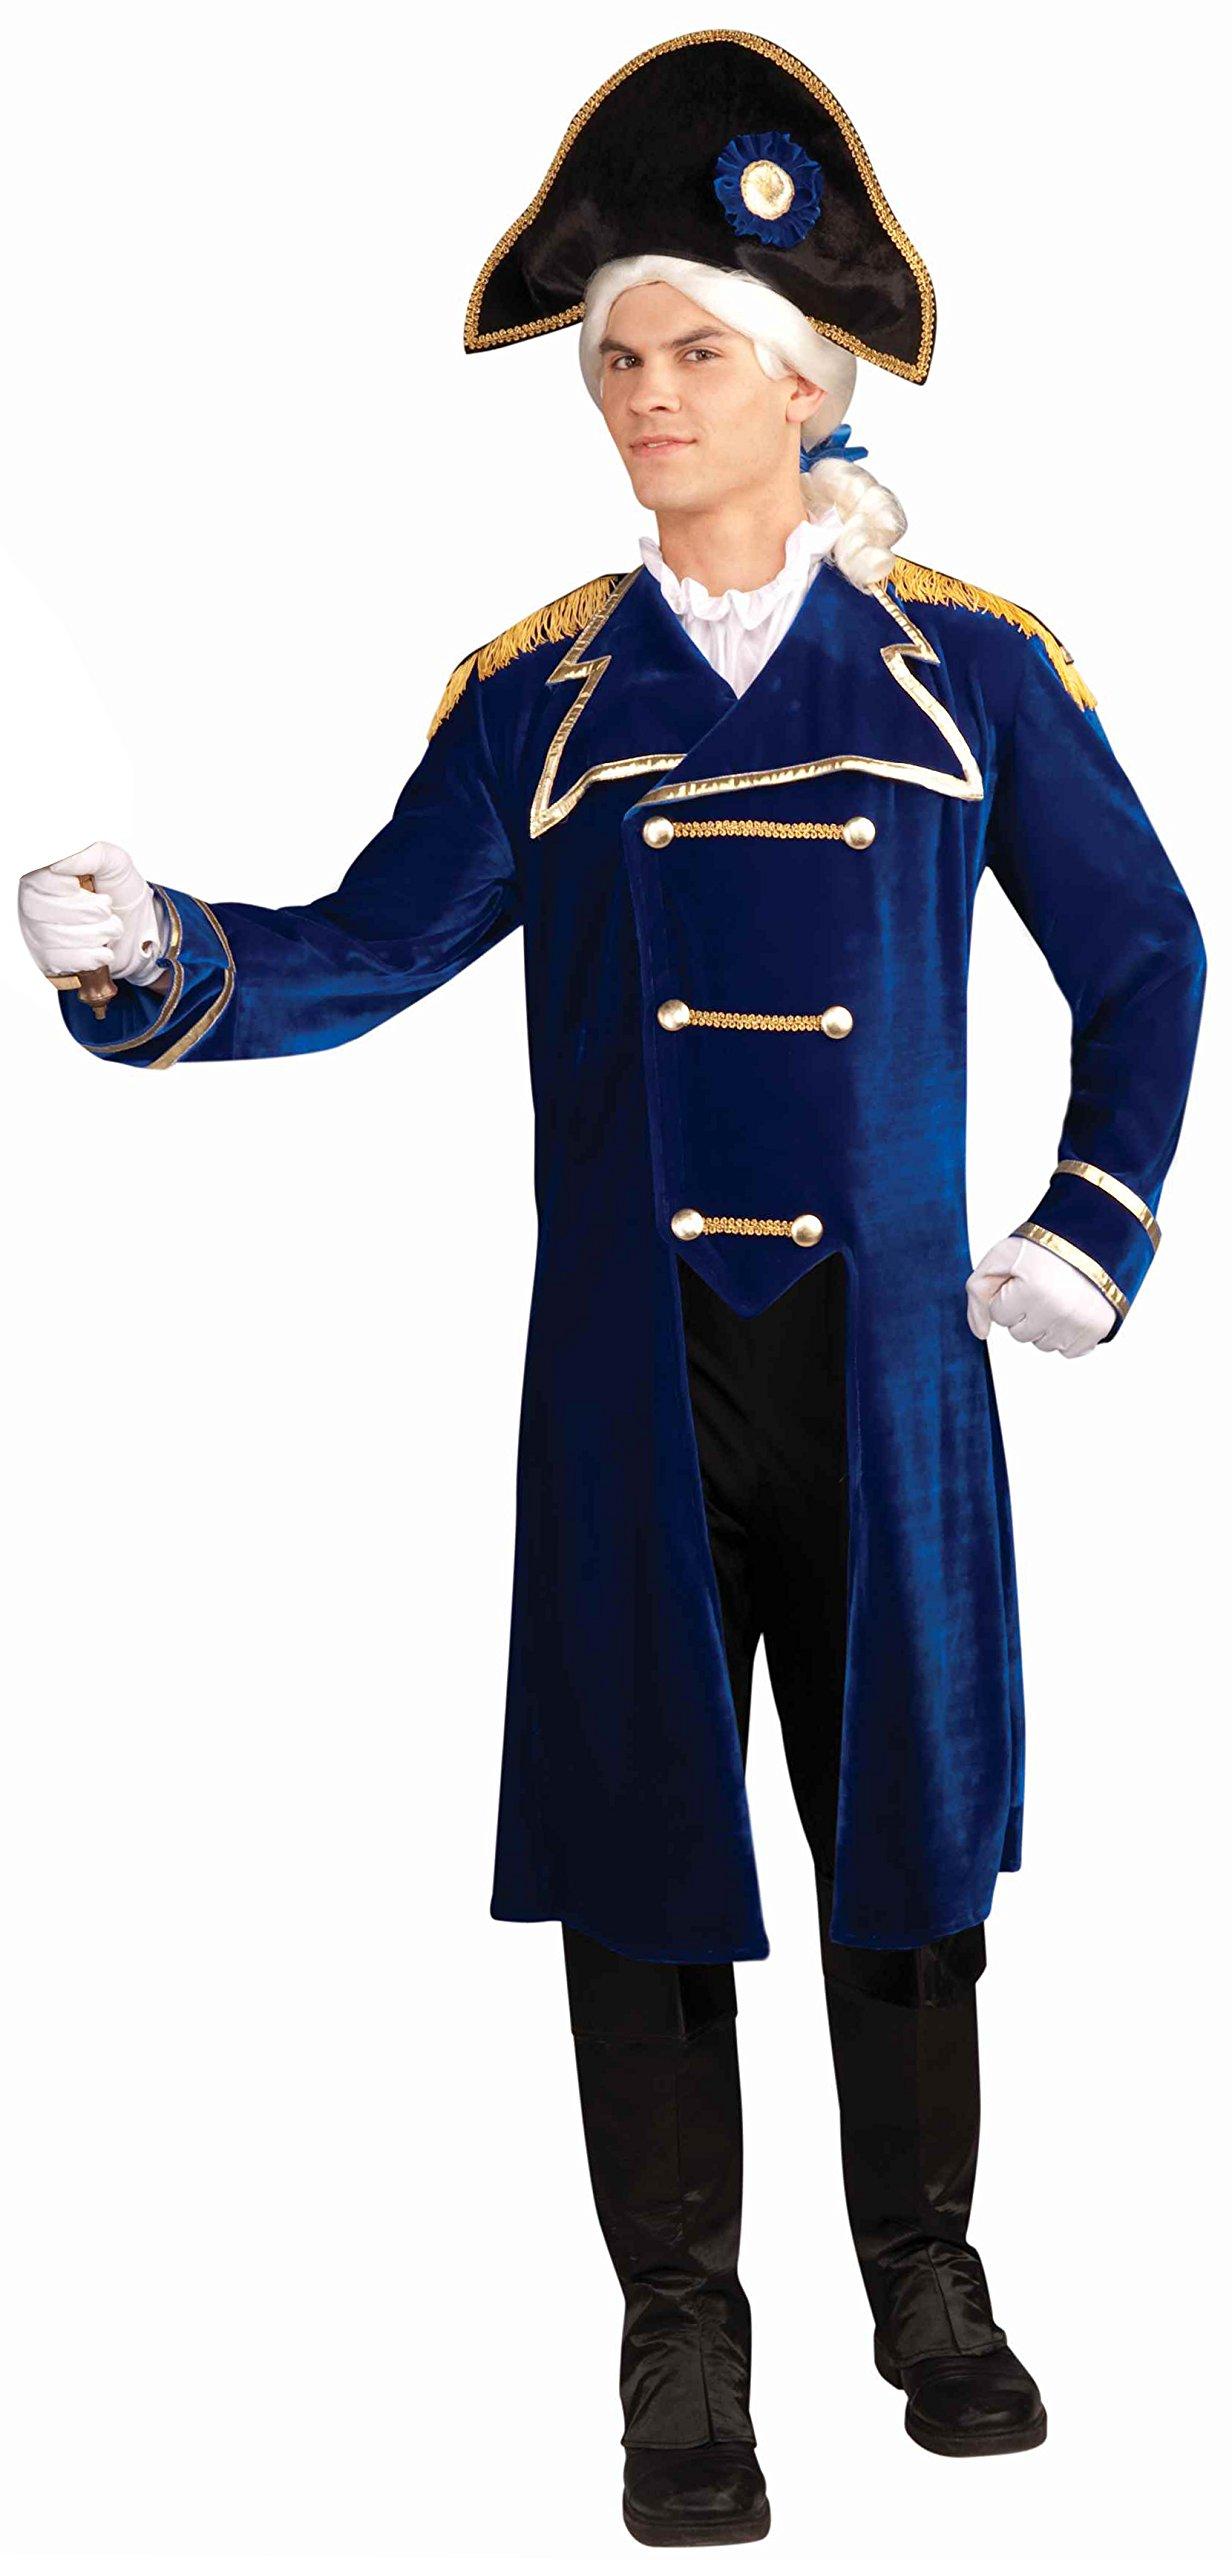 Forum Novelties Men's Patriotic Party Deluxe Admiral Costume, Multi, One Size